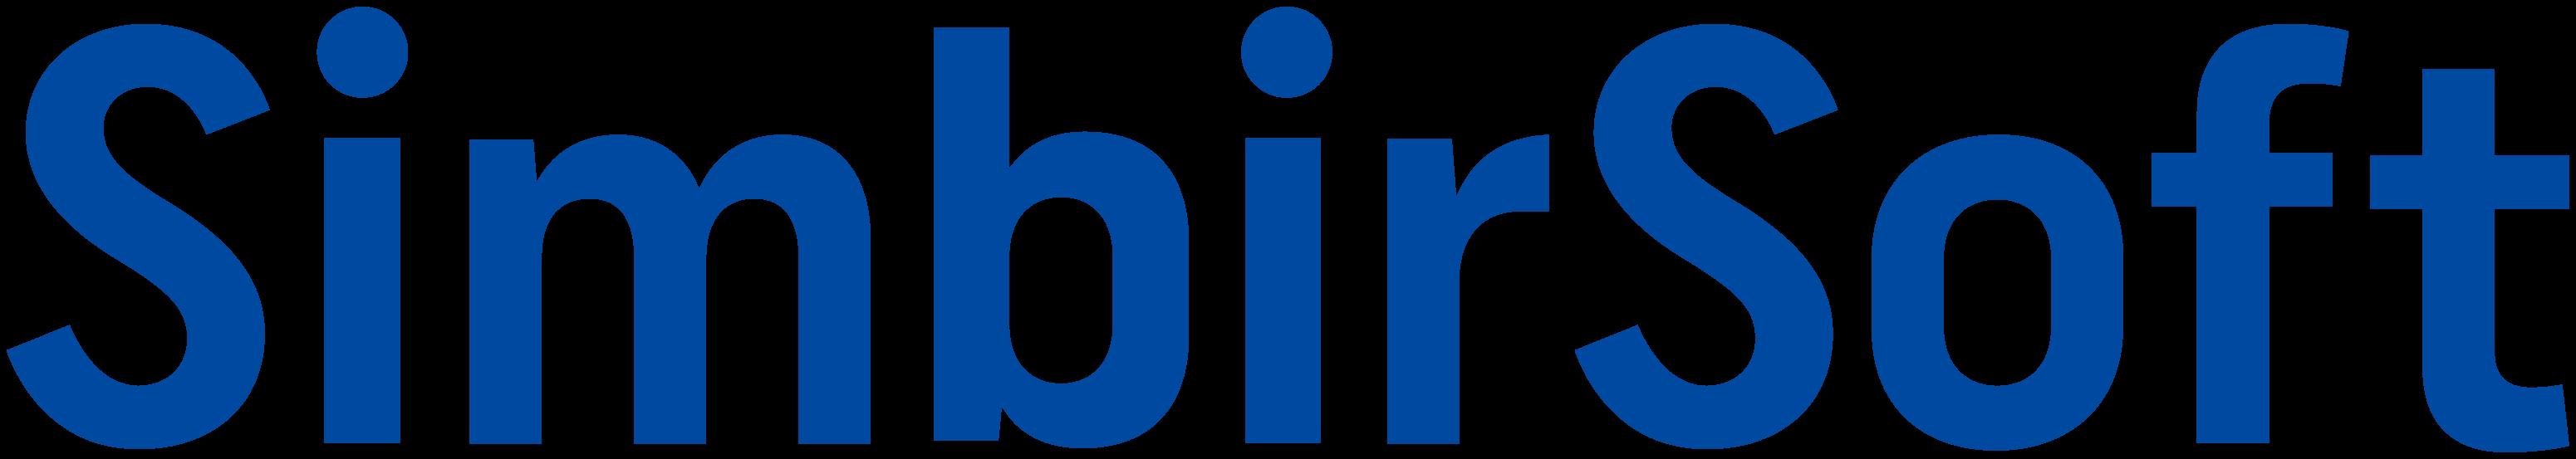 SimbirSoft logo